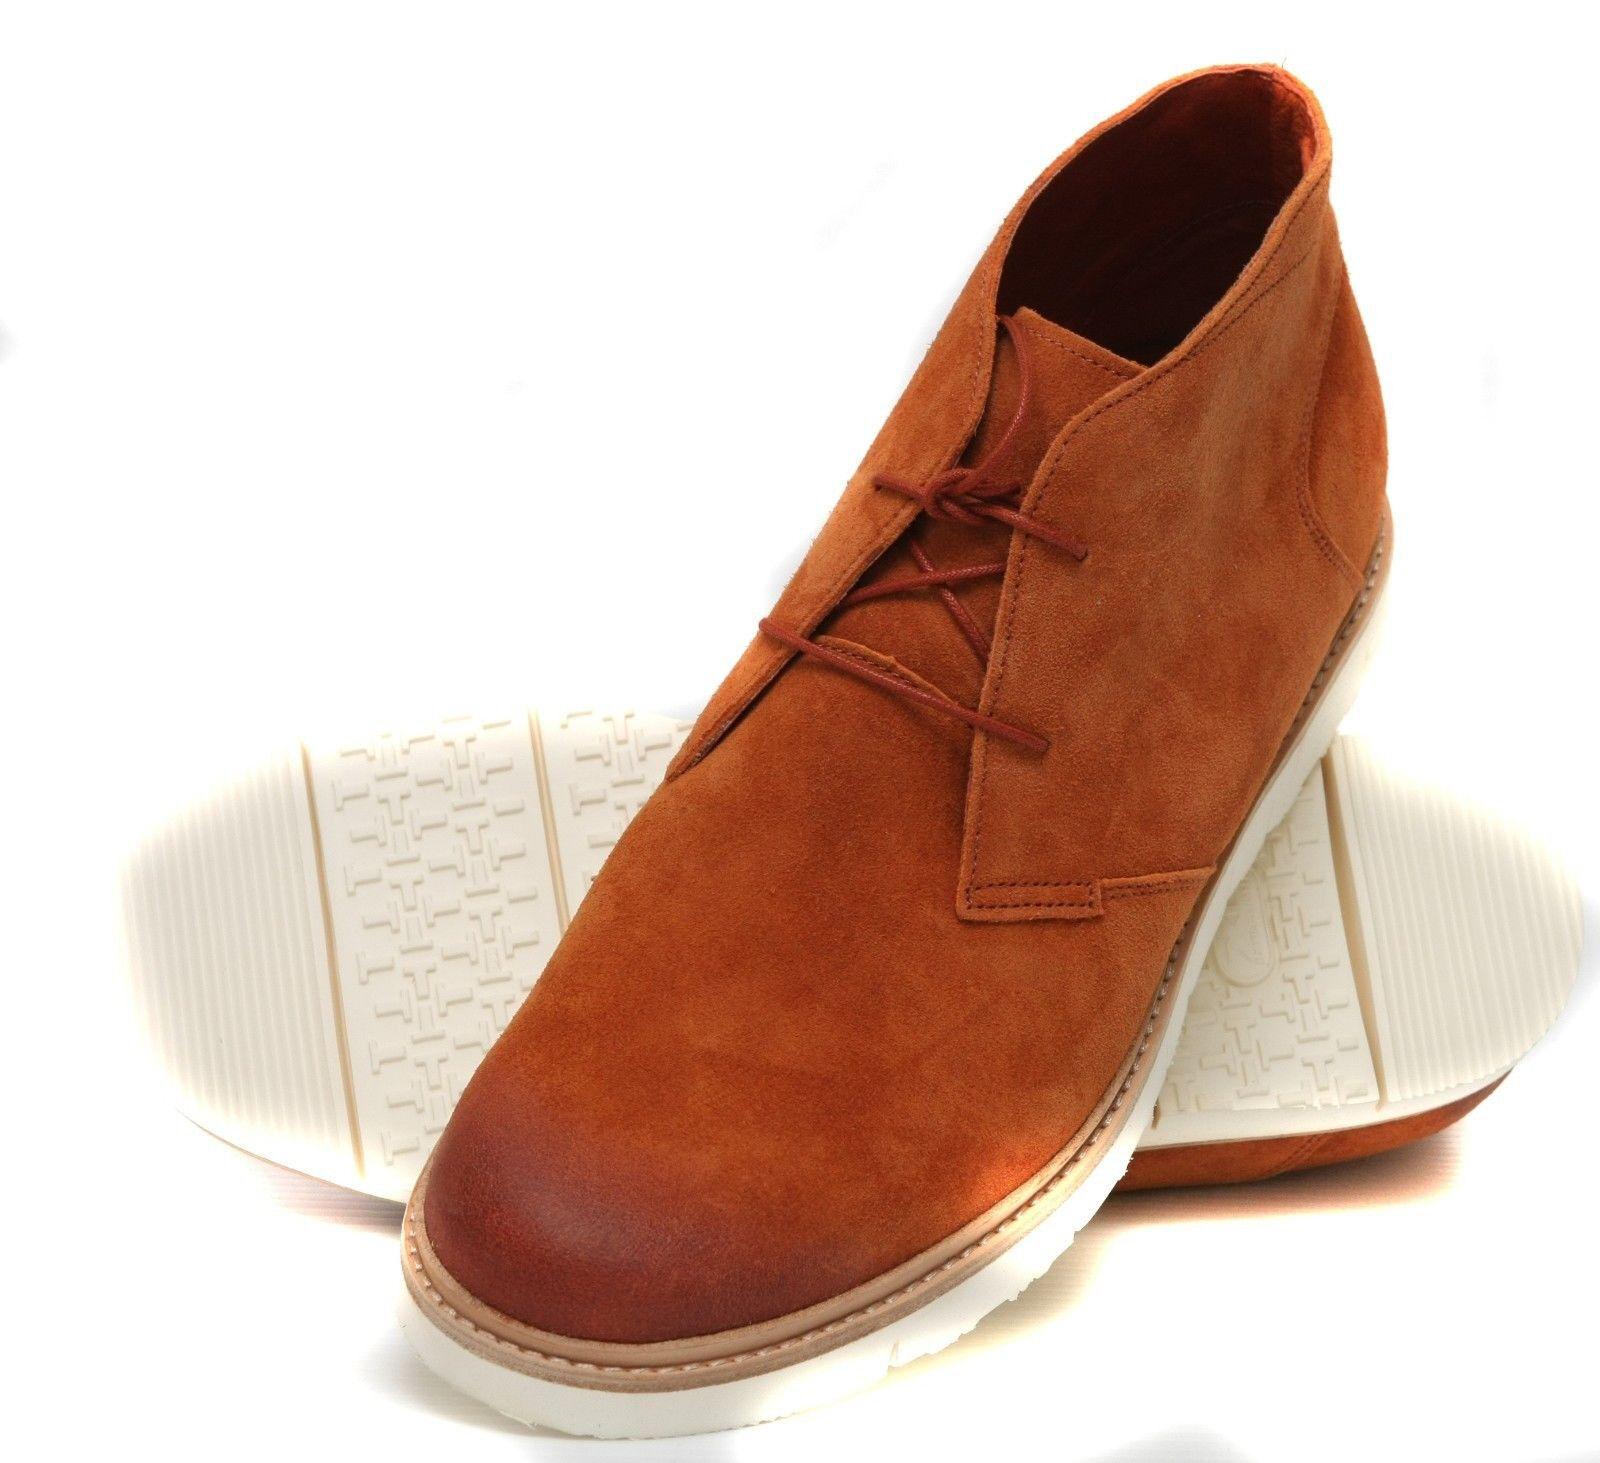 New Tsubo Uomo Suede Ankle avvio scarpe scarpe scarpe Sz USA 11,EU 44.5 7c89e0